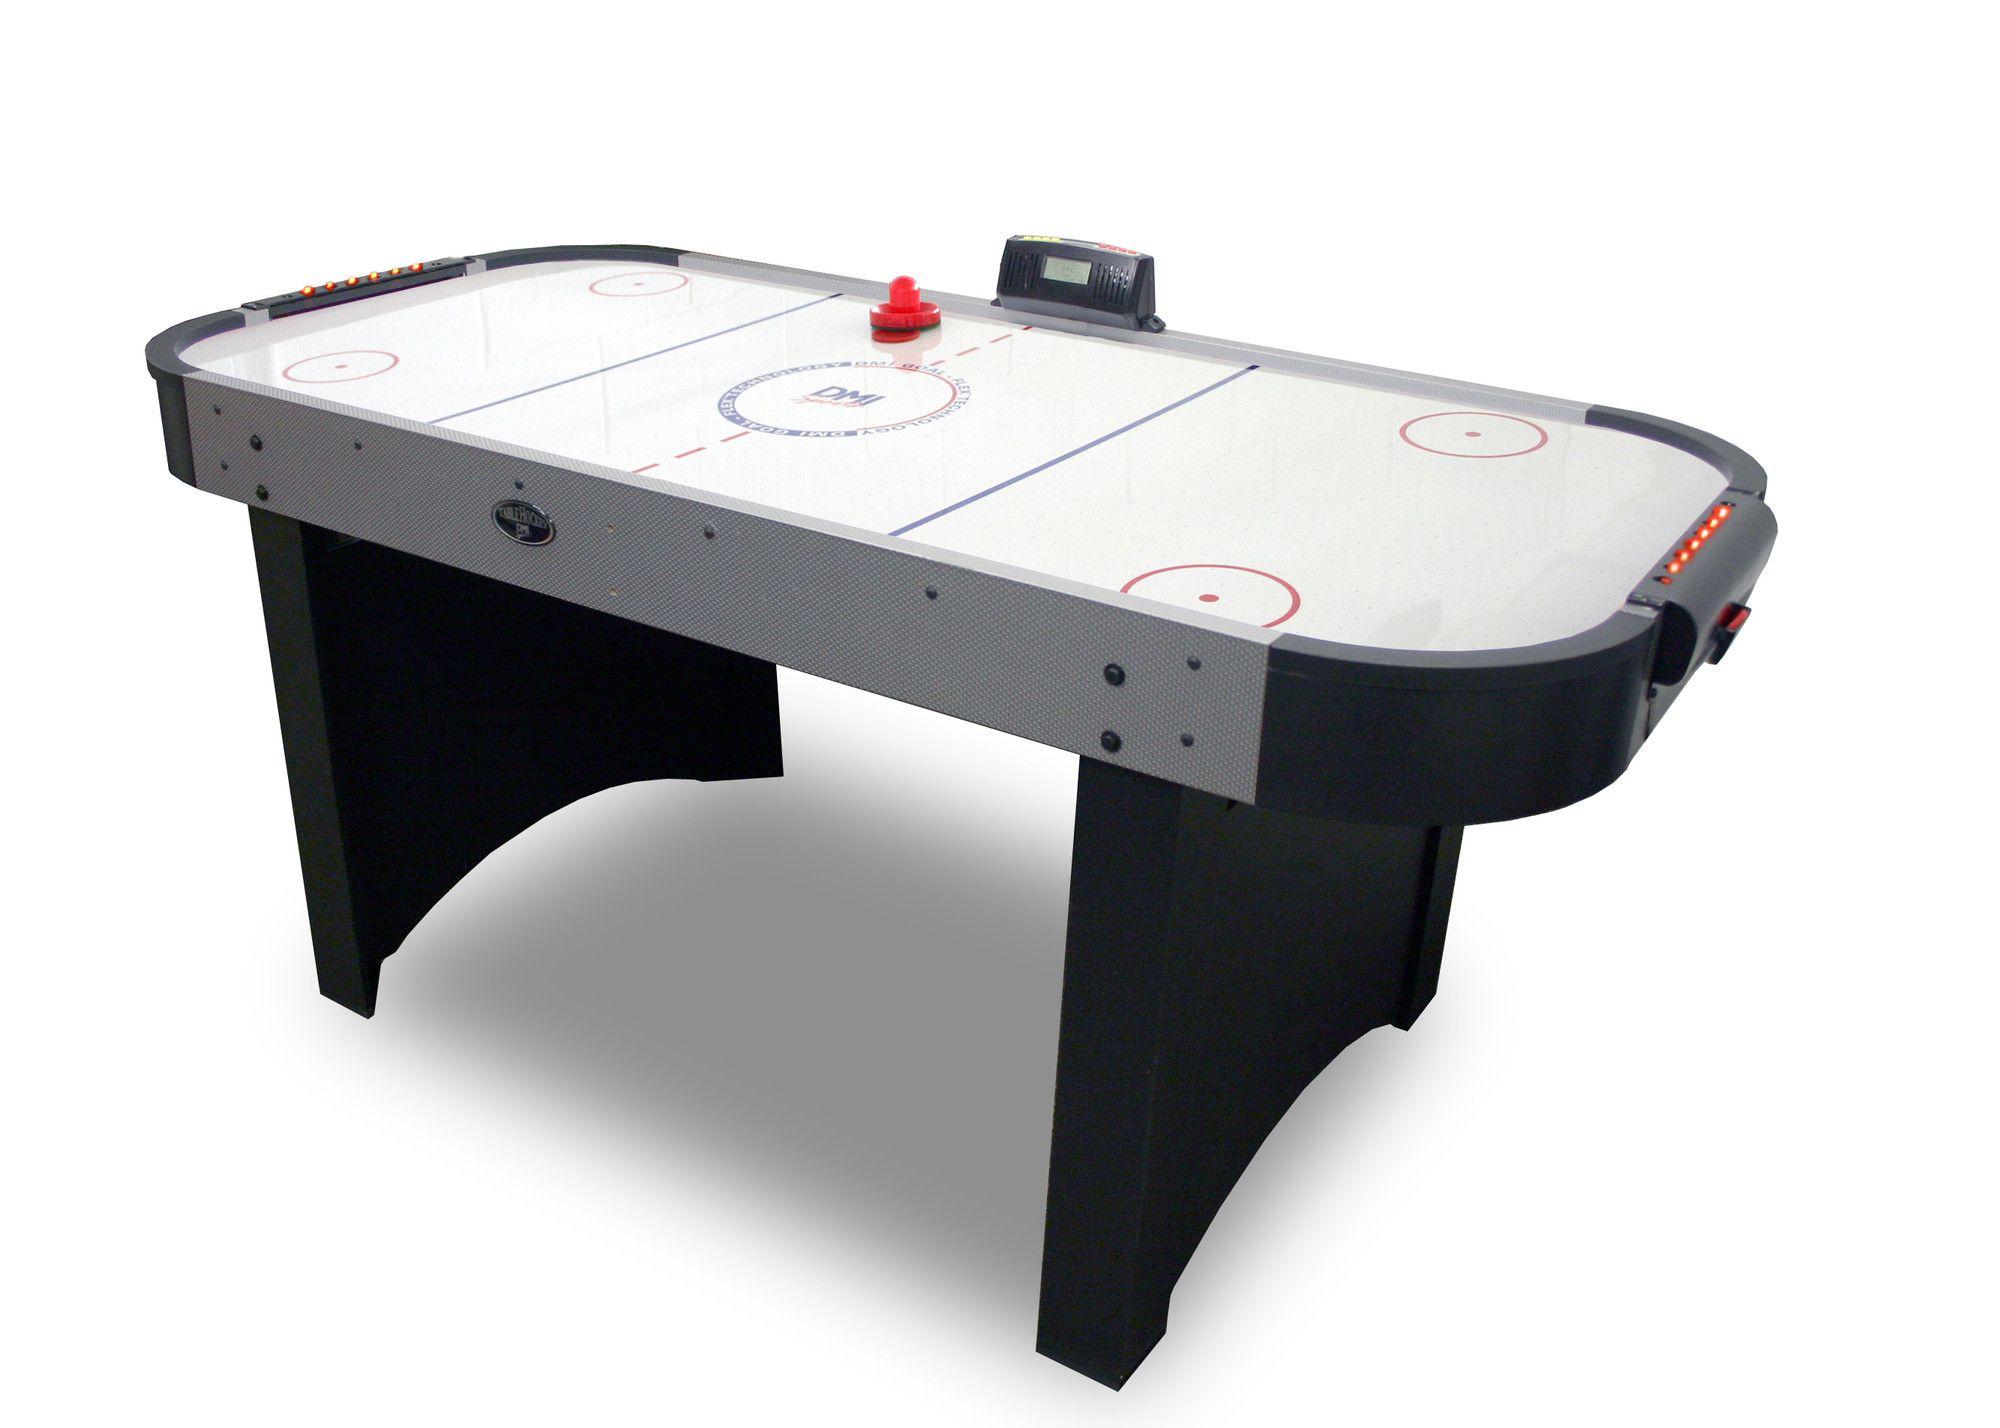 Charmant DMI Sports 6u0027 Air Hockey Table With Goal Flex 180 U0026 Reviews   Wayfair